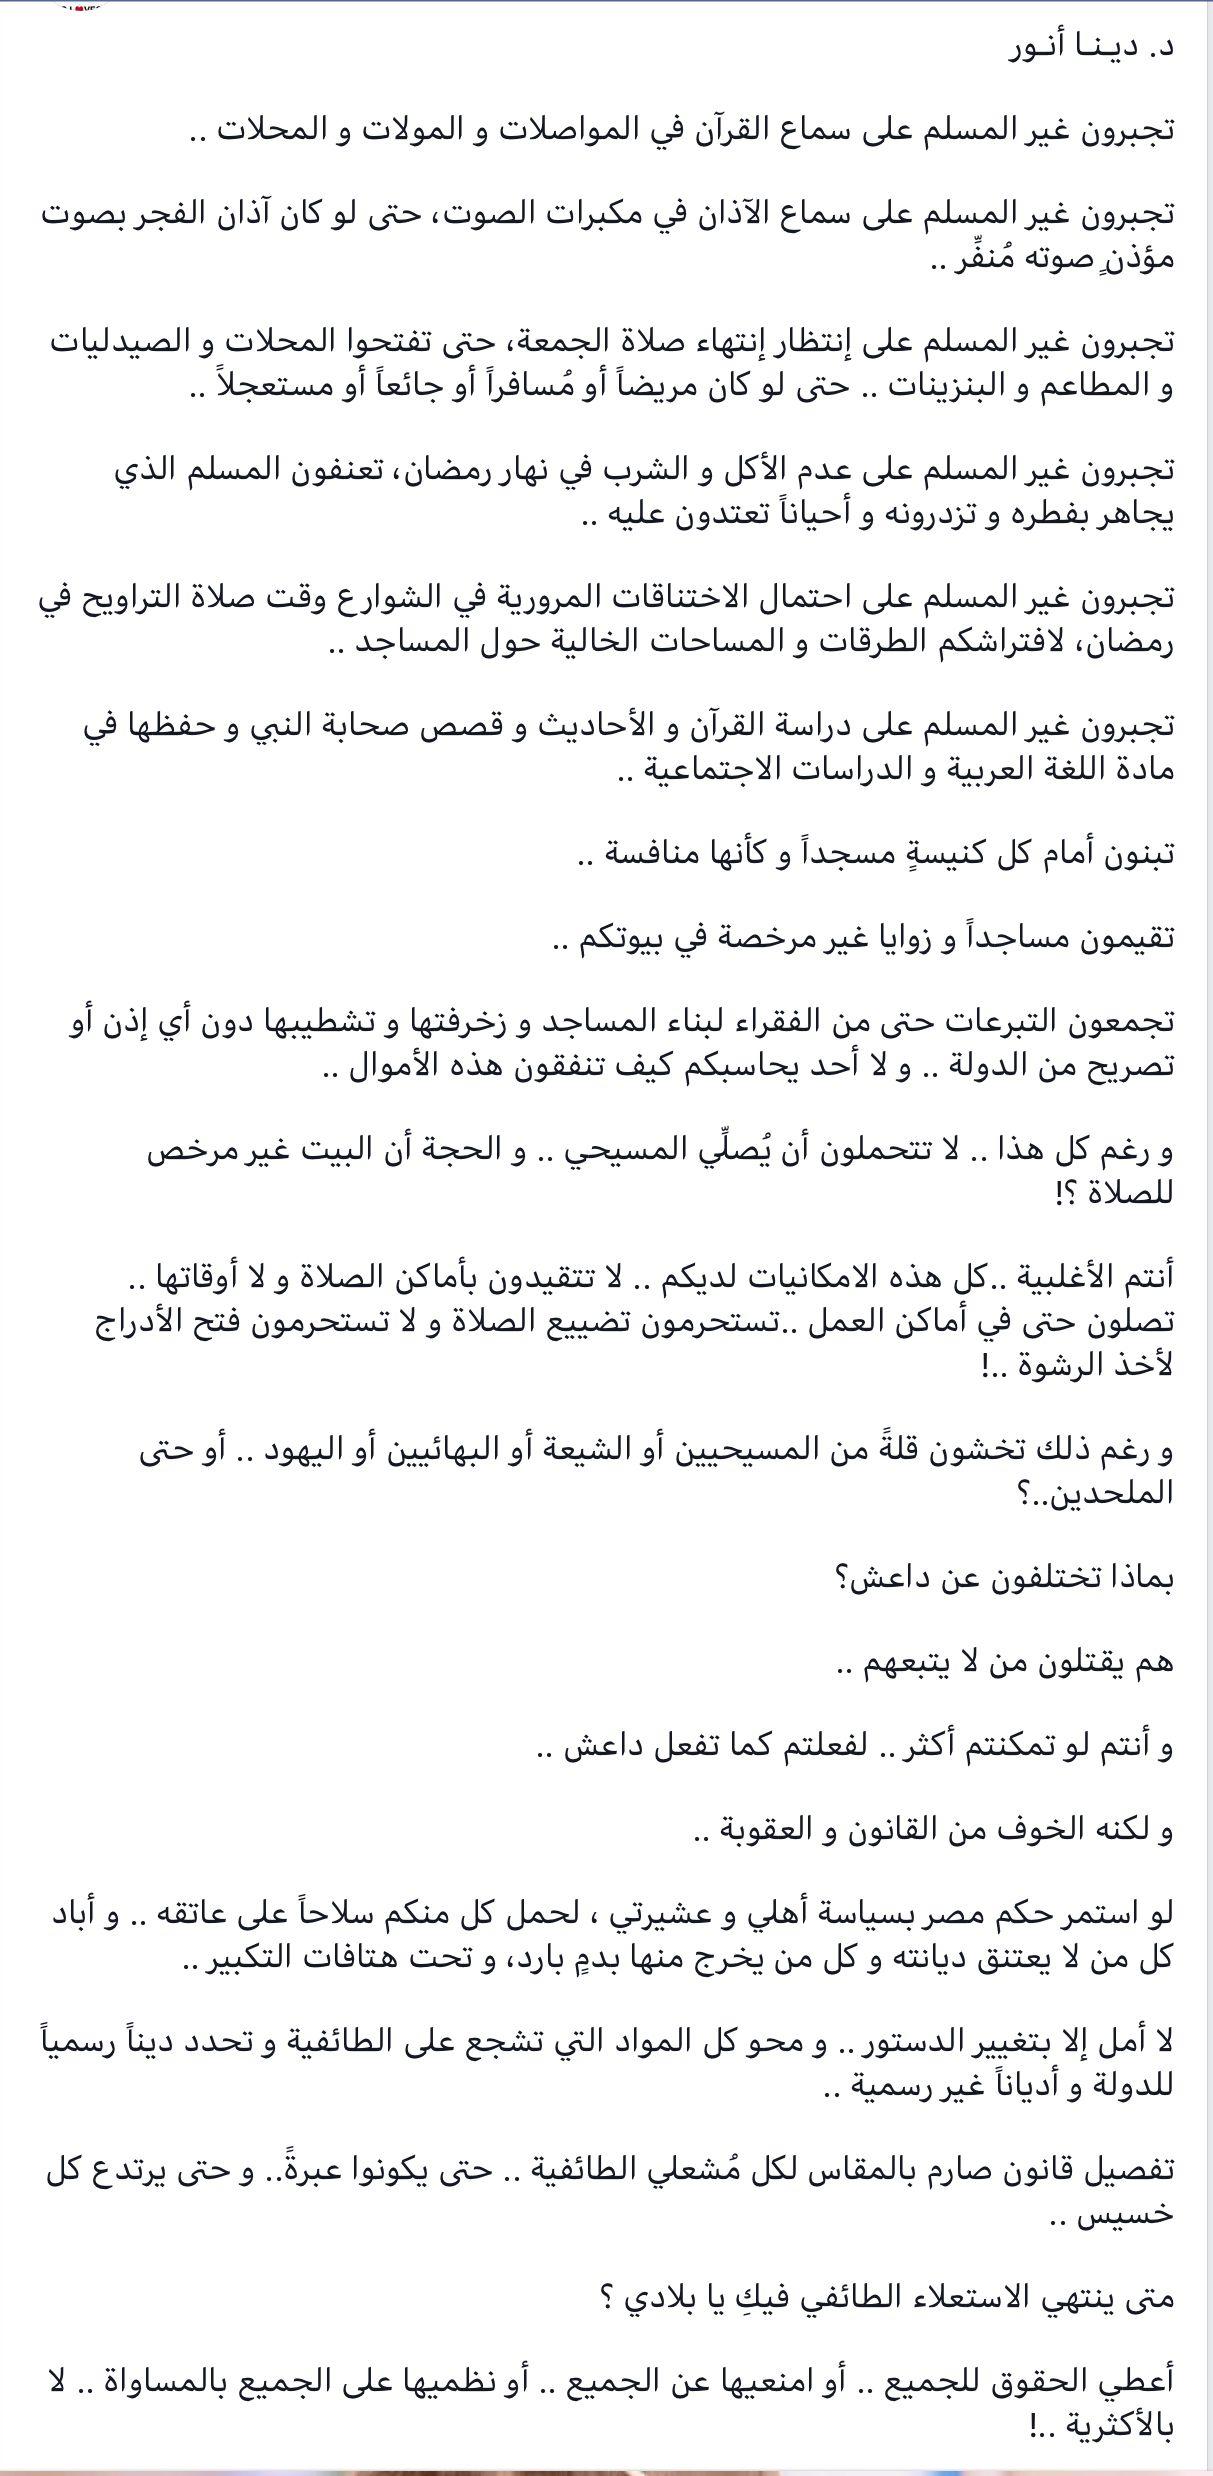 Pin By Joseph Youssef On صح النوم يا مصر Math Math Equations Egypt